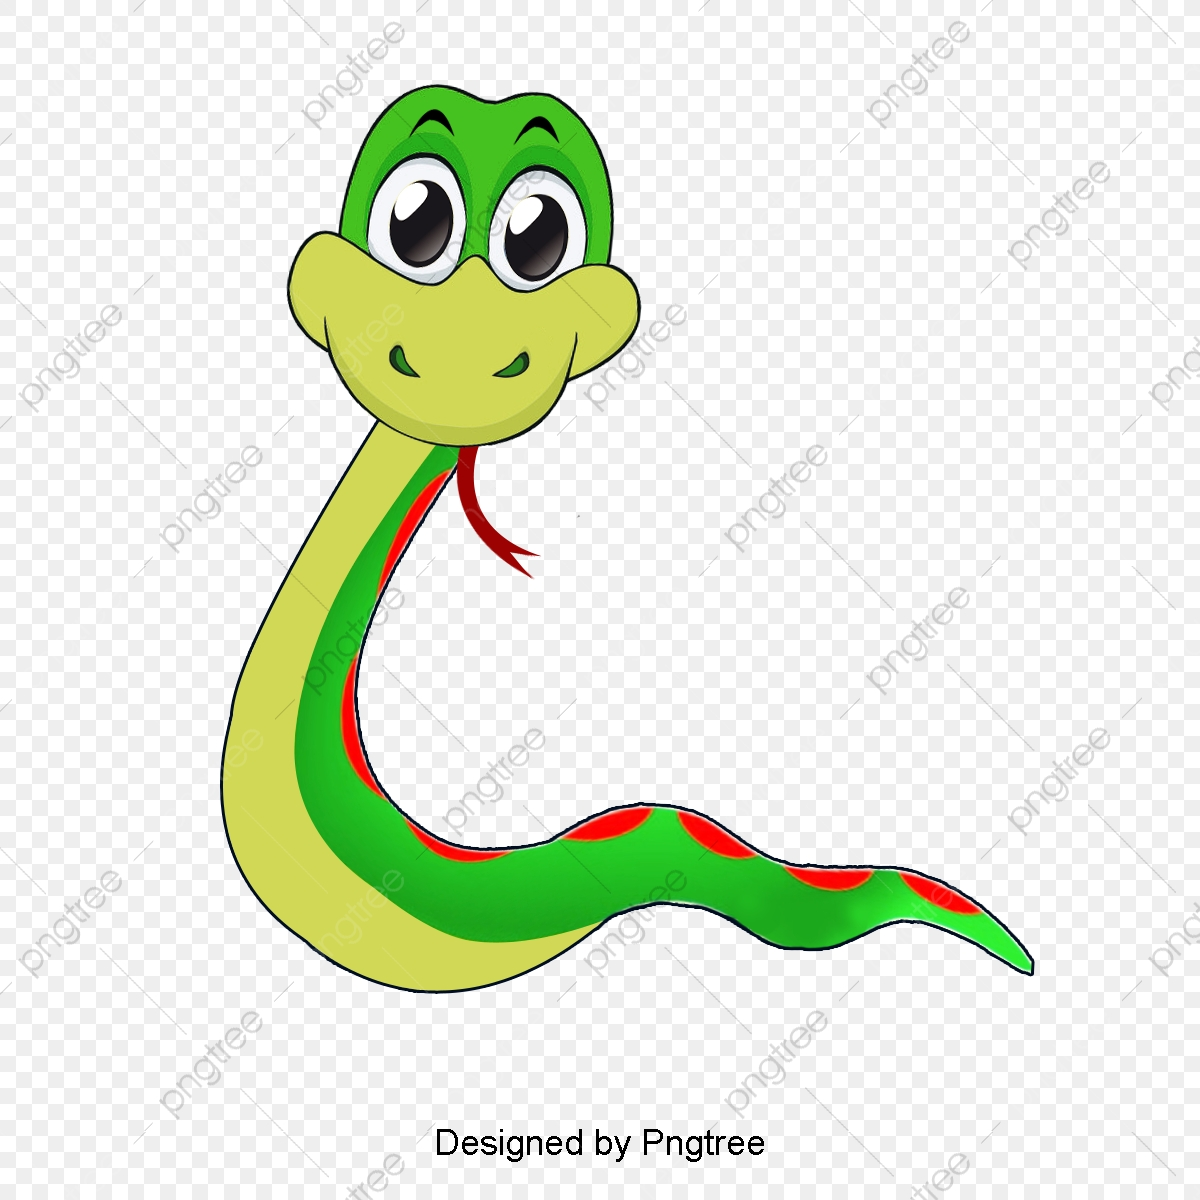 Snake clipart file. Animal png transparent image